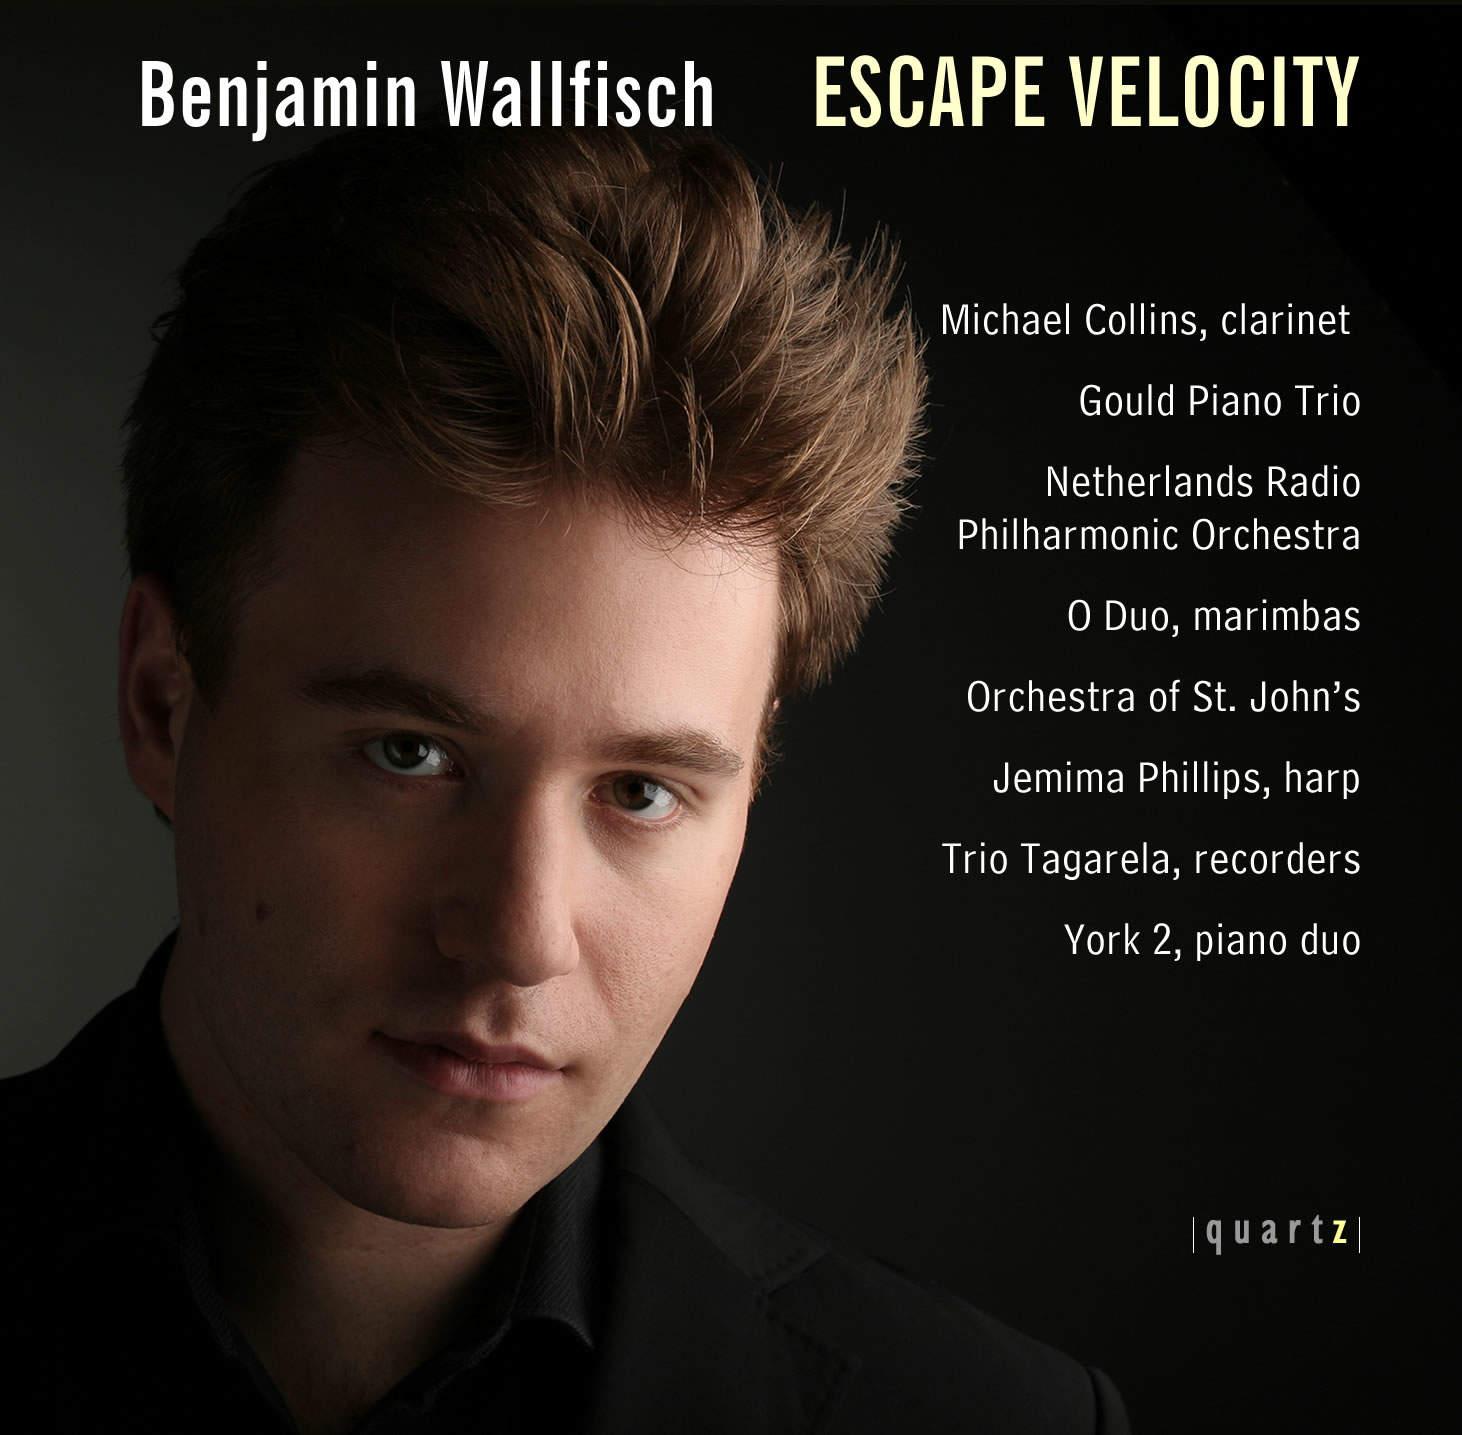 Benjamin Wallfisch (composer)